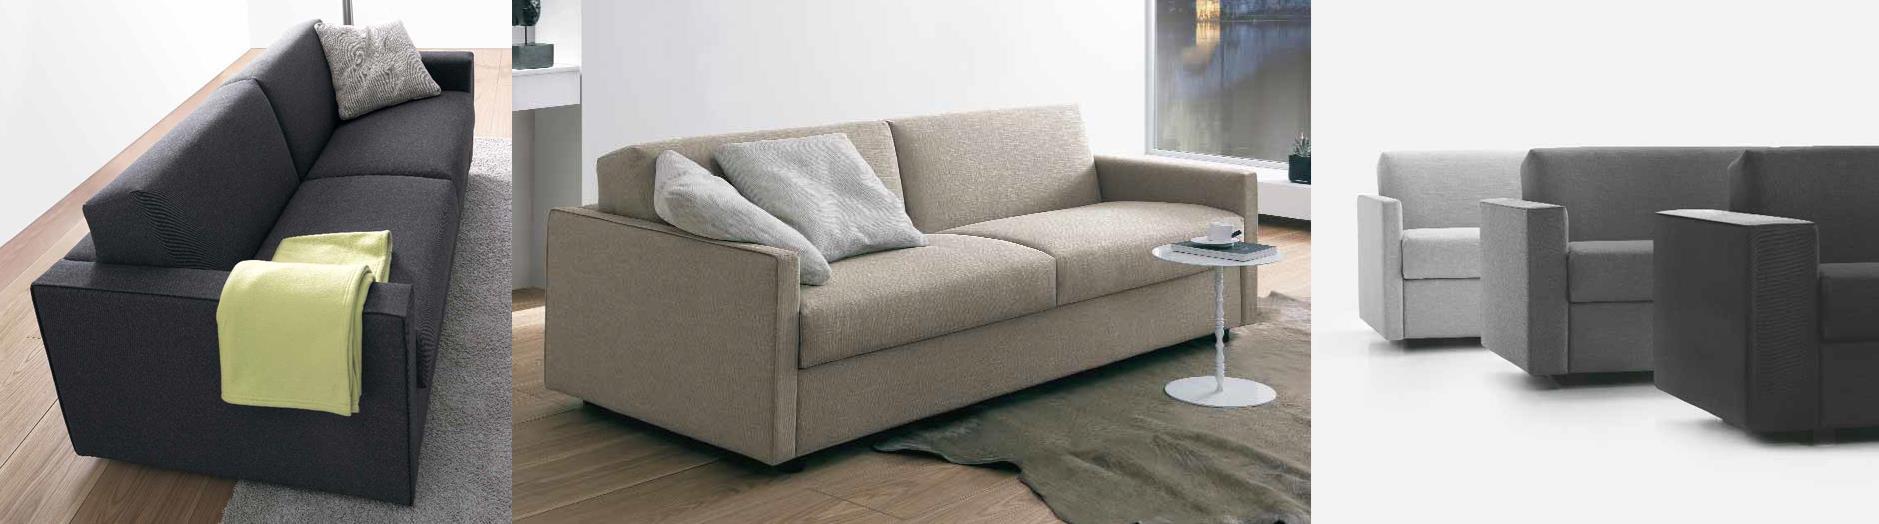 Stelvio-Sofa-Bed